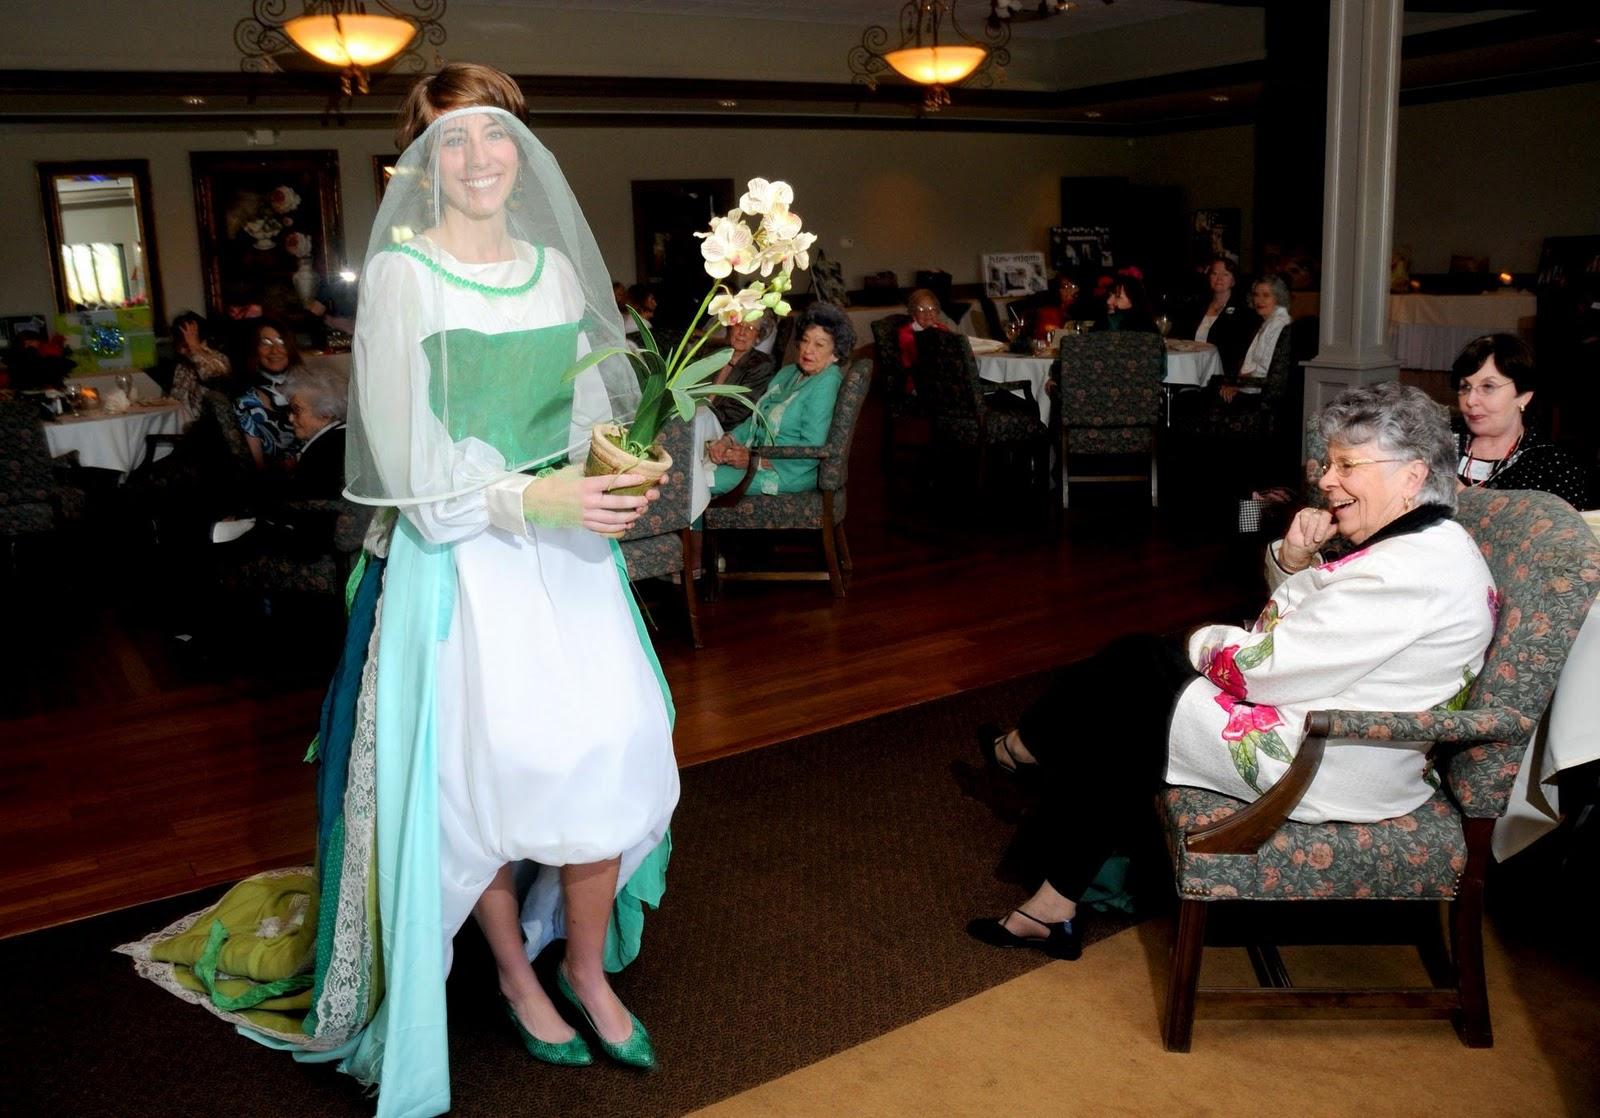 models a wedding dress she